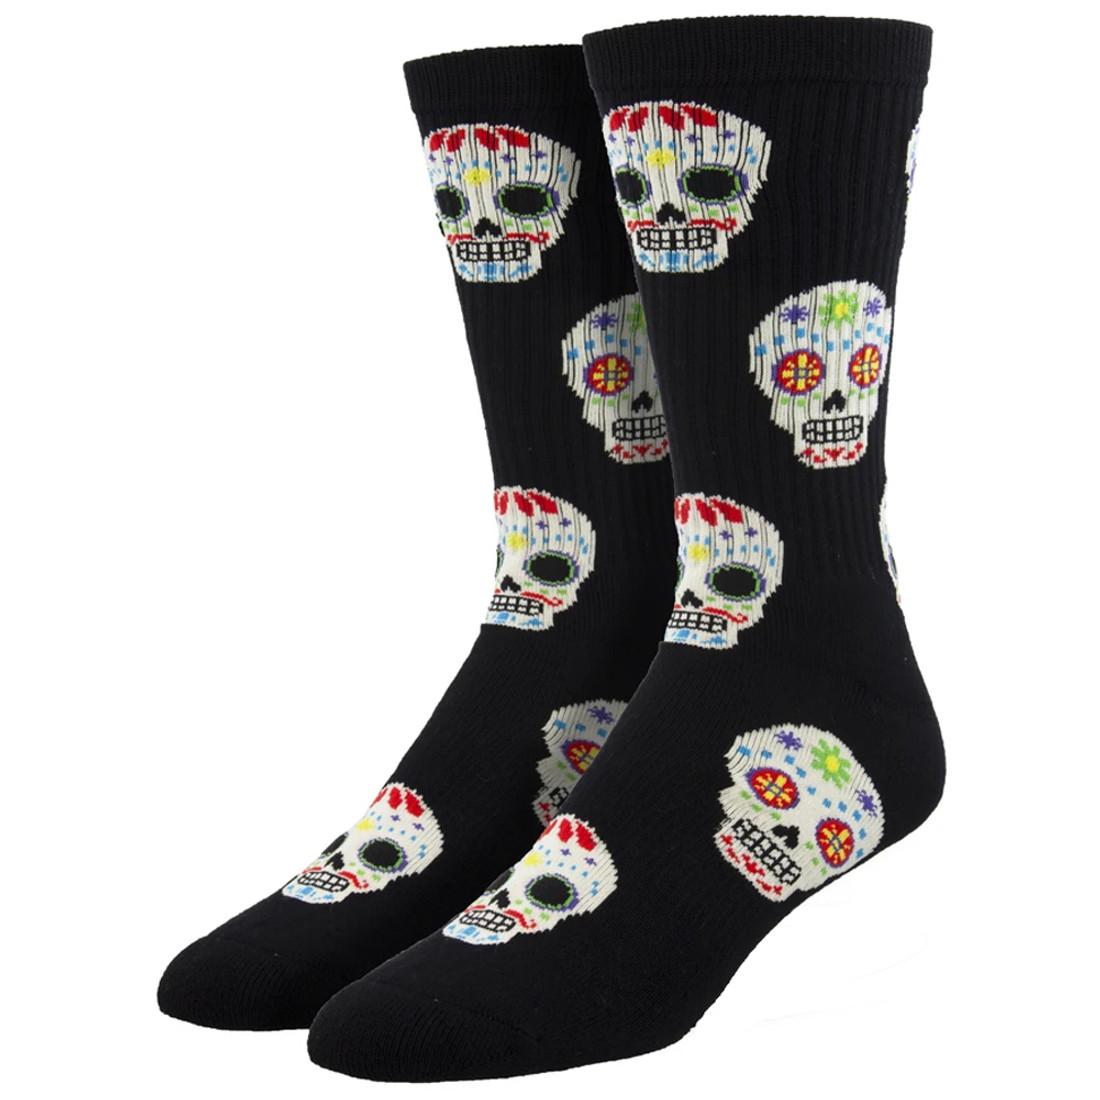 Candy Skulls Men's Athletic Crew Socks